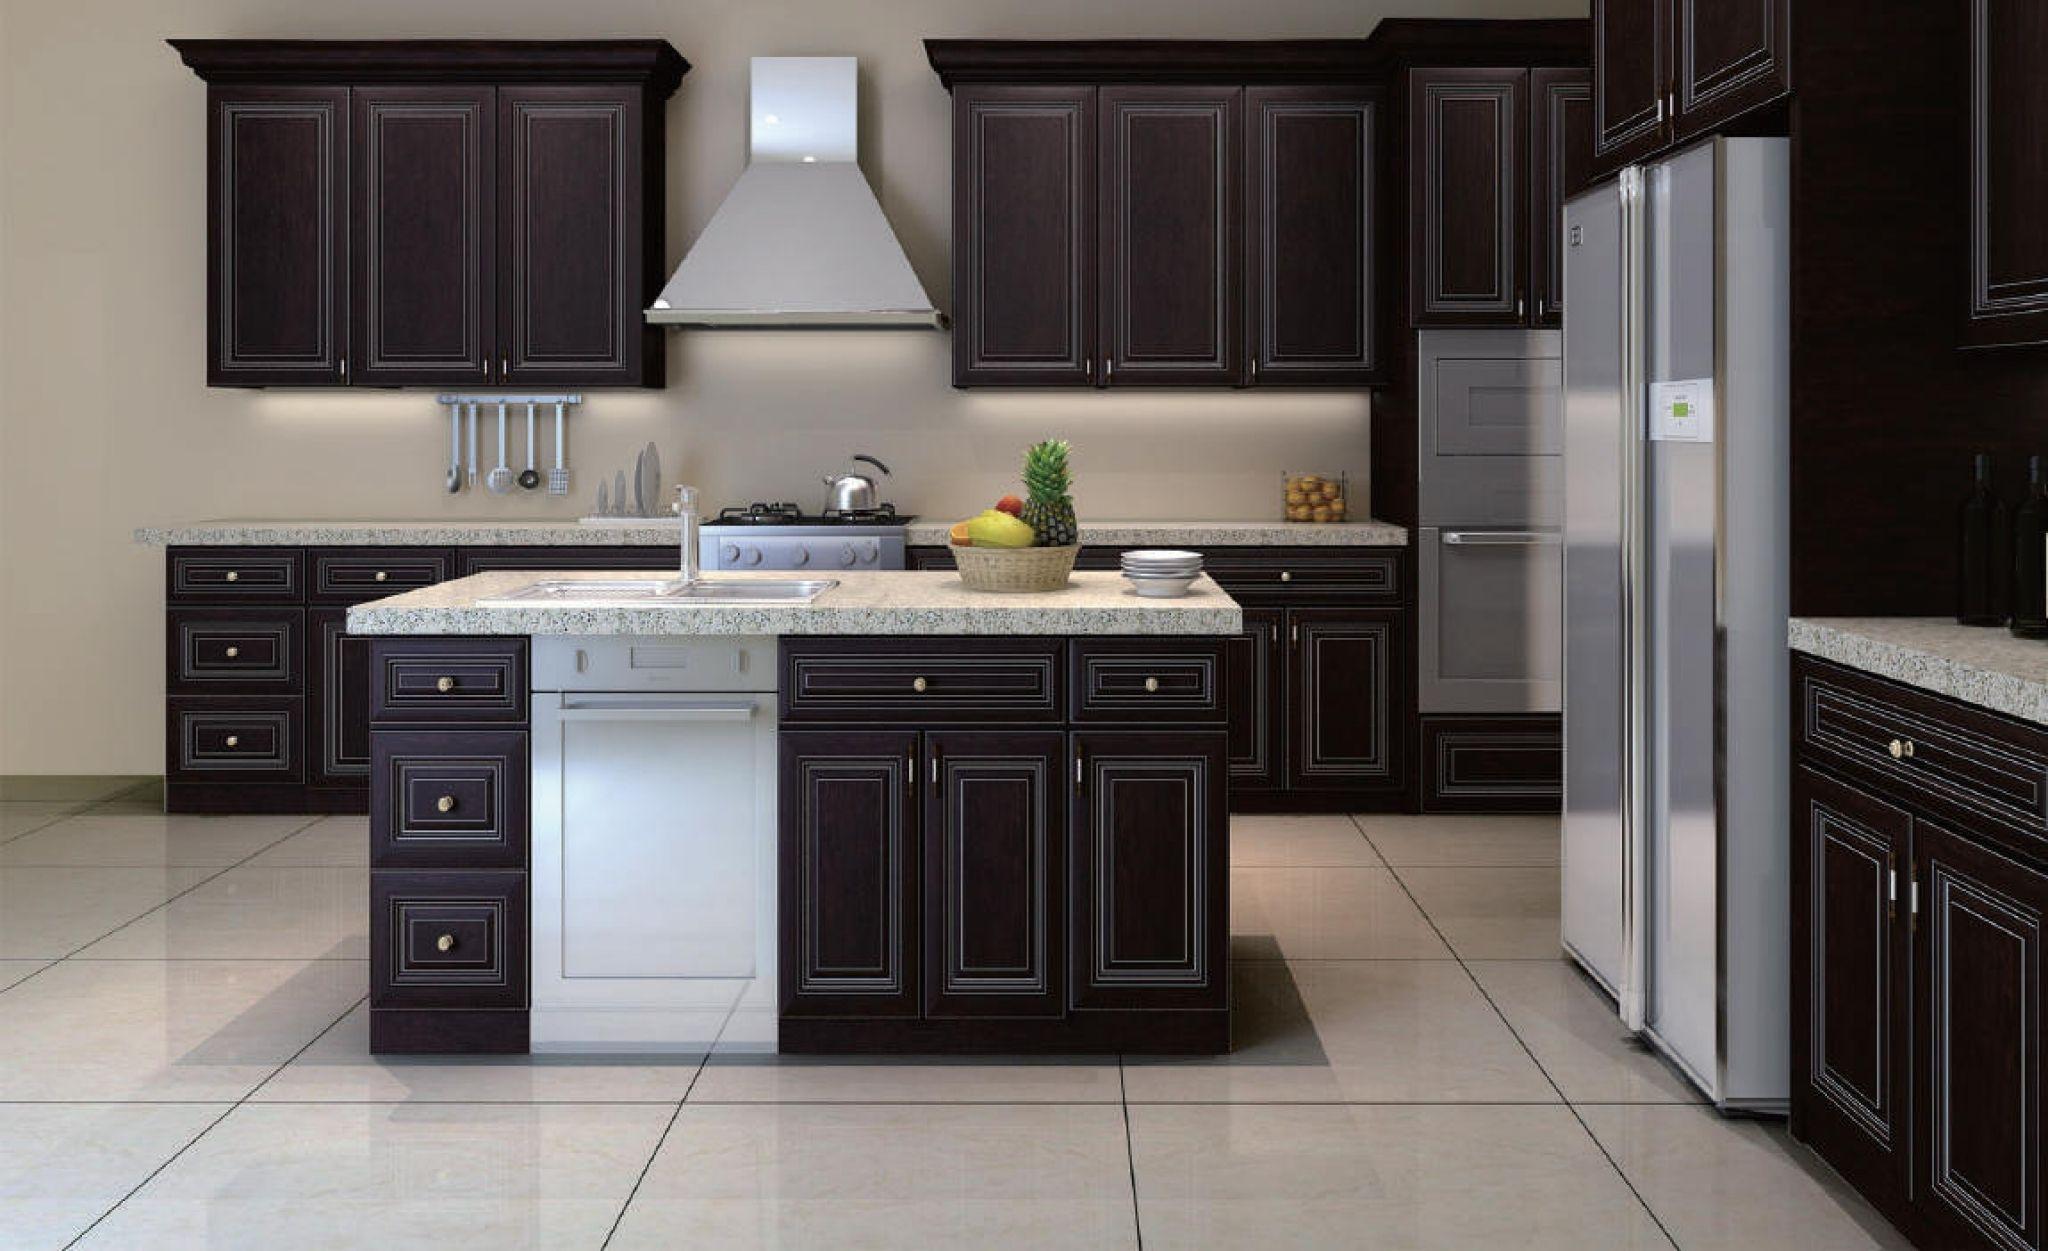 Mocha Kitchen Cabinets Kitchen Decor Ideas On A Budget Check More